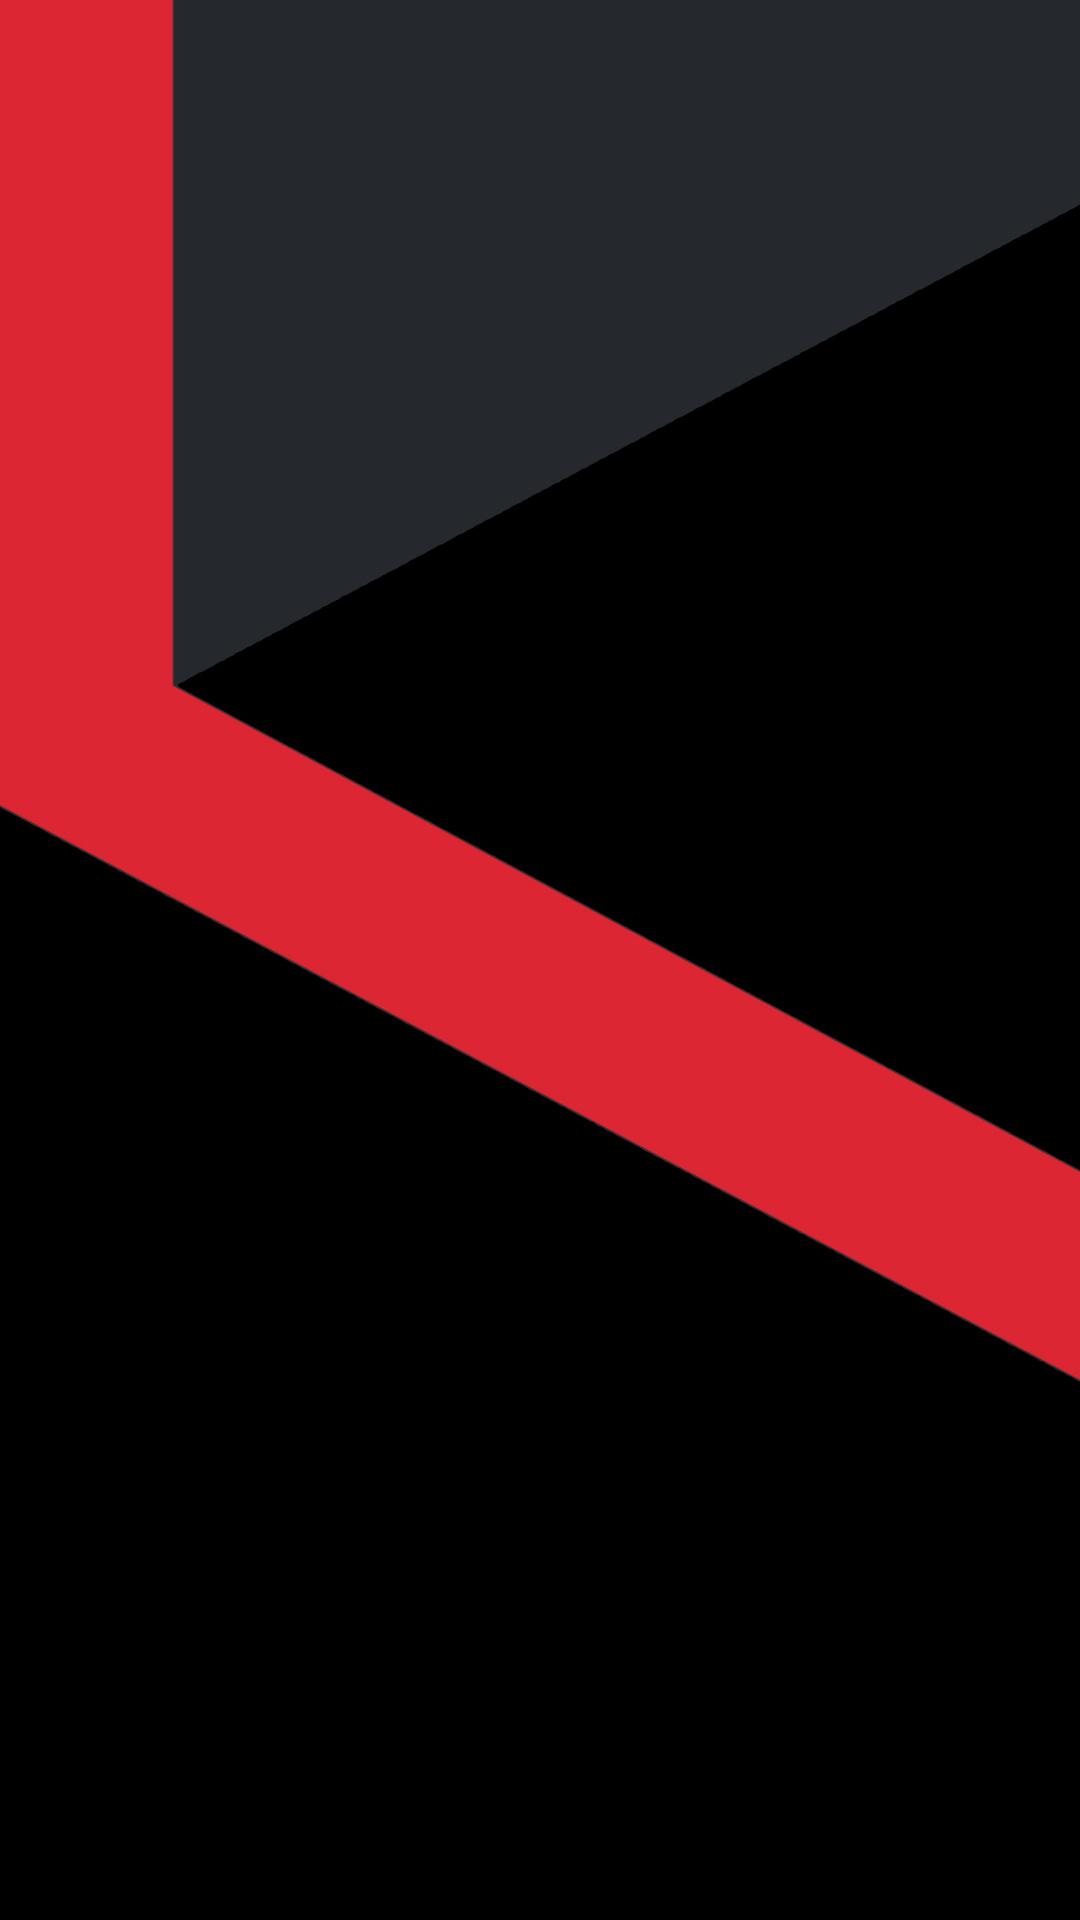 eba8b835f7cad4 1080x1920 MKBHD Logo Black Background 5k Iphone 7